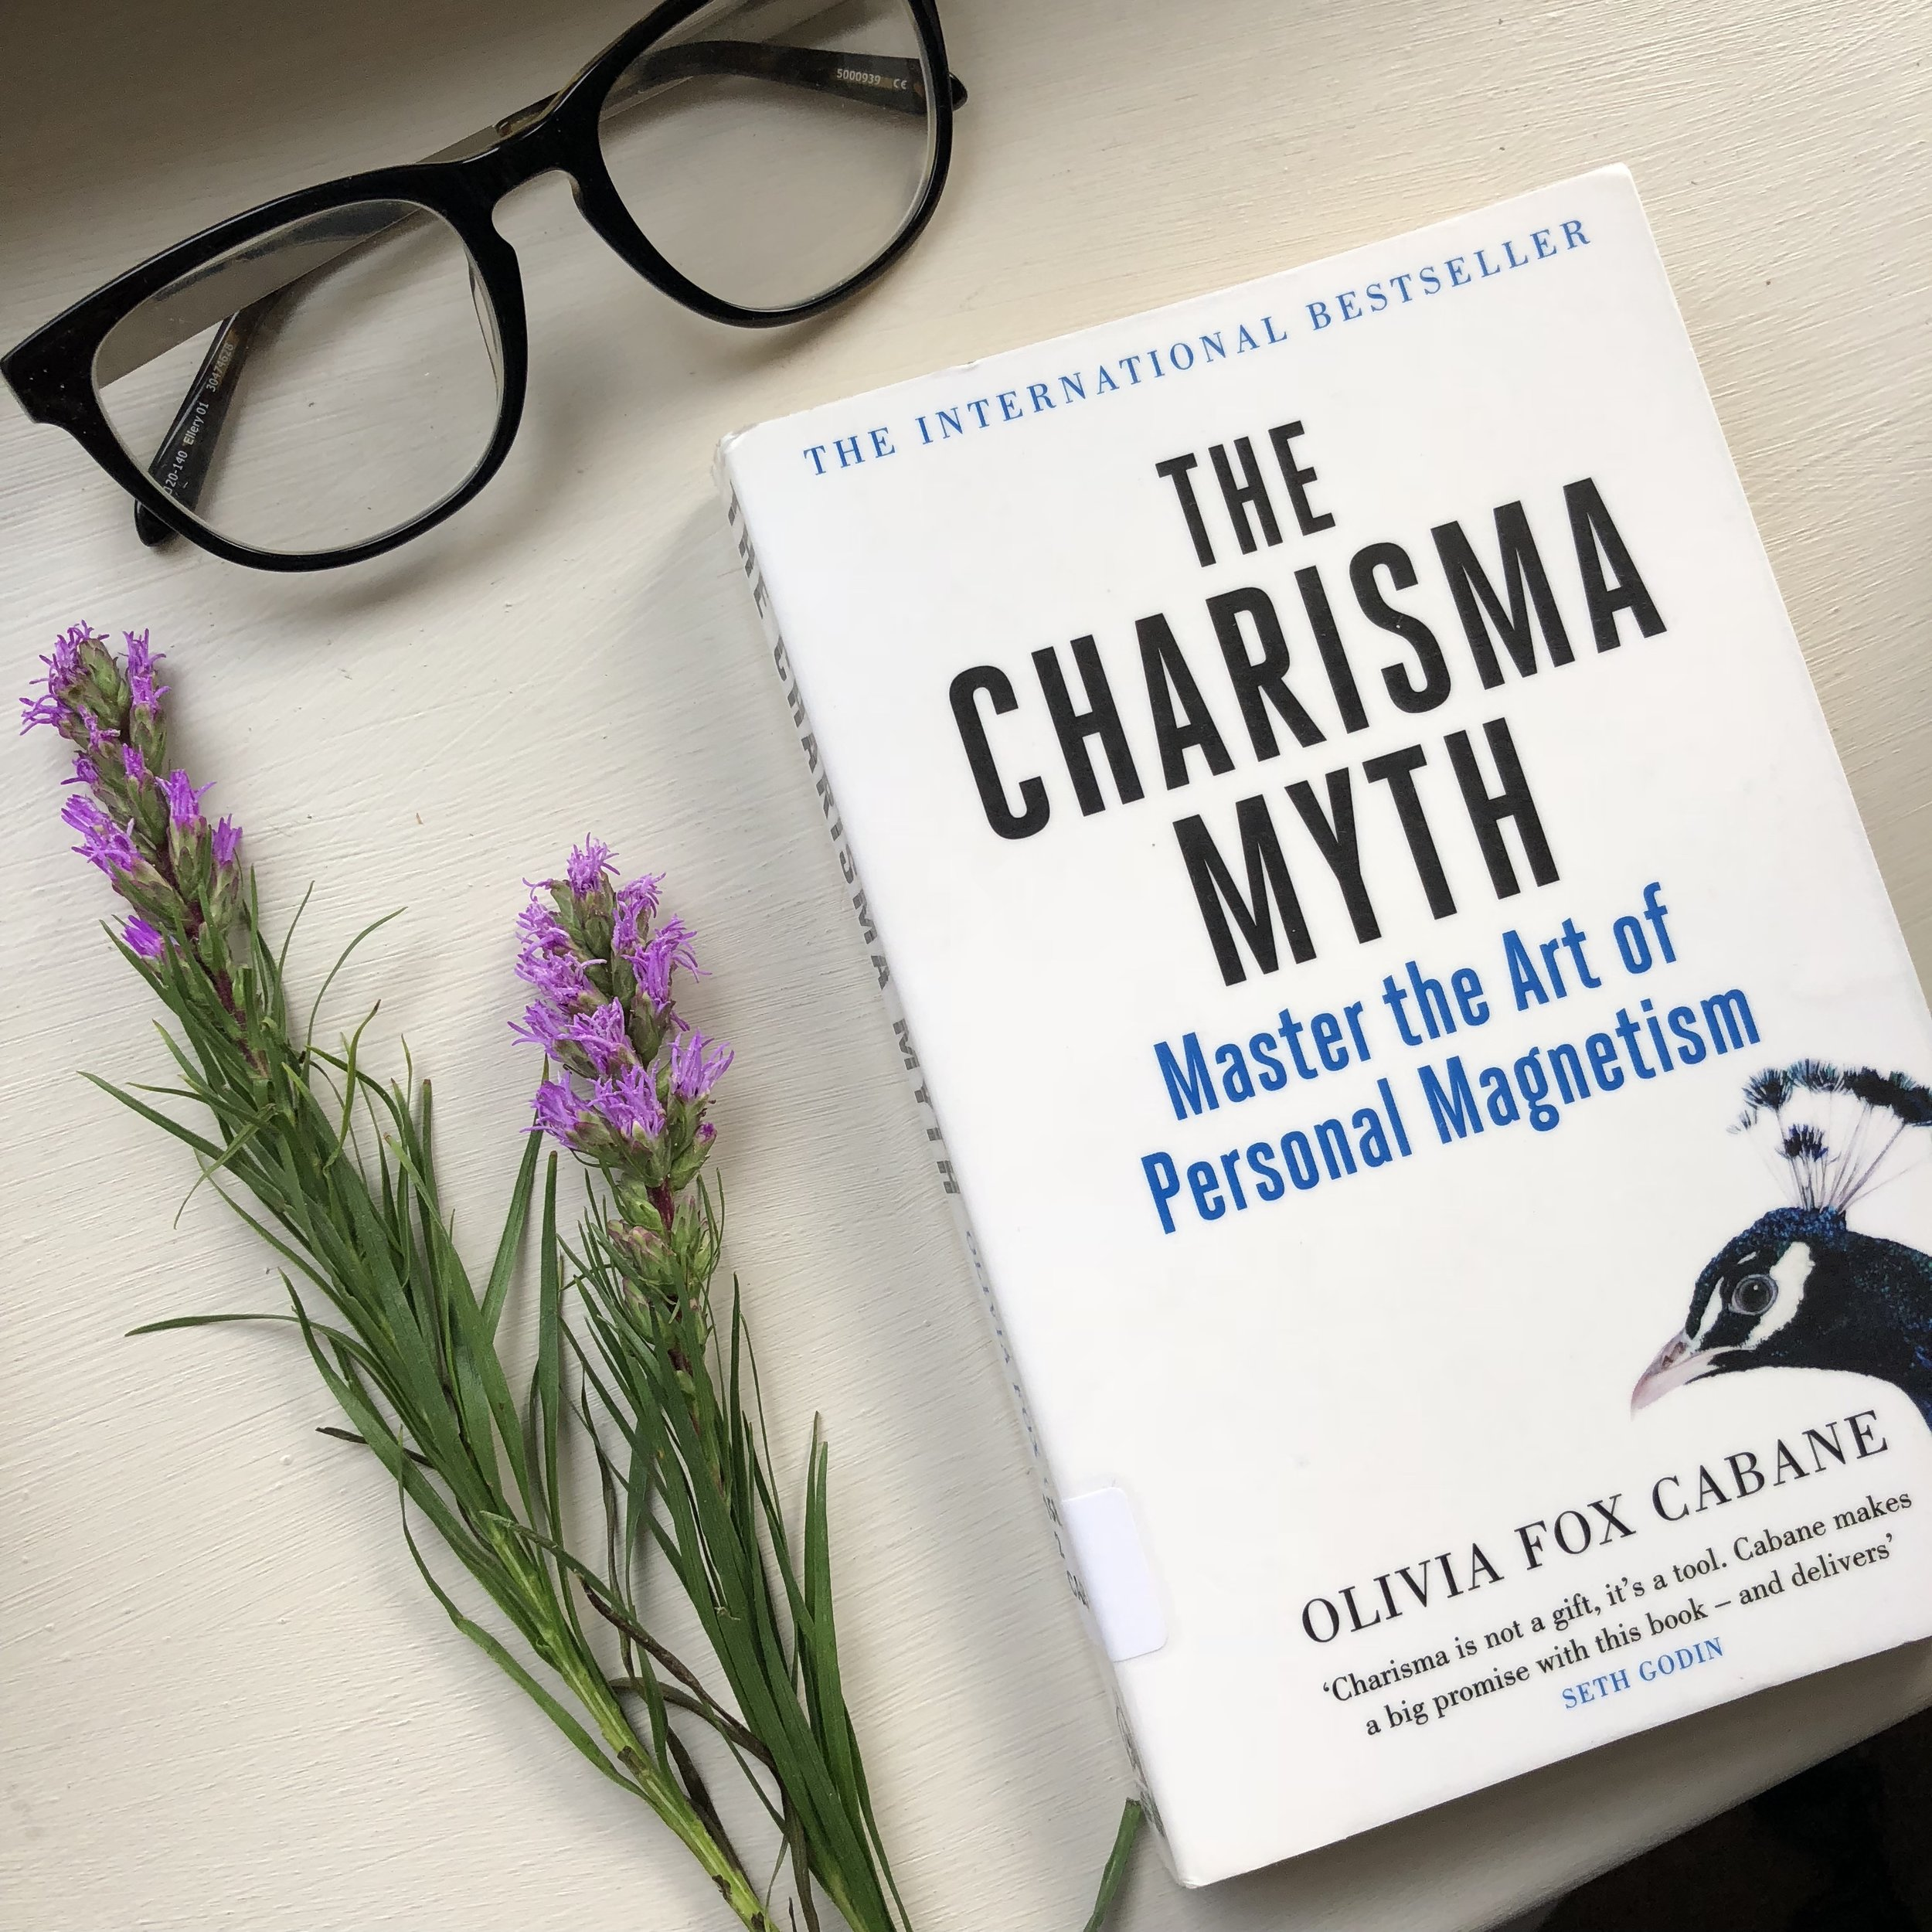 books-all-career-girls-should-read-the-charisma-myth-olivia-fox-cabane.jpg